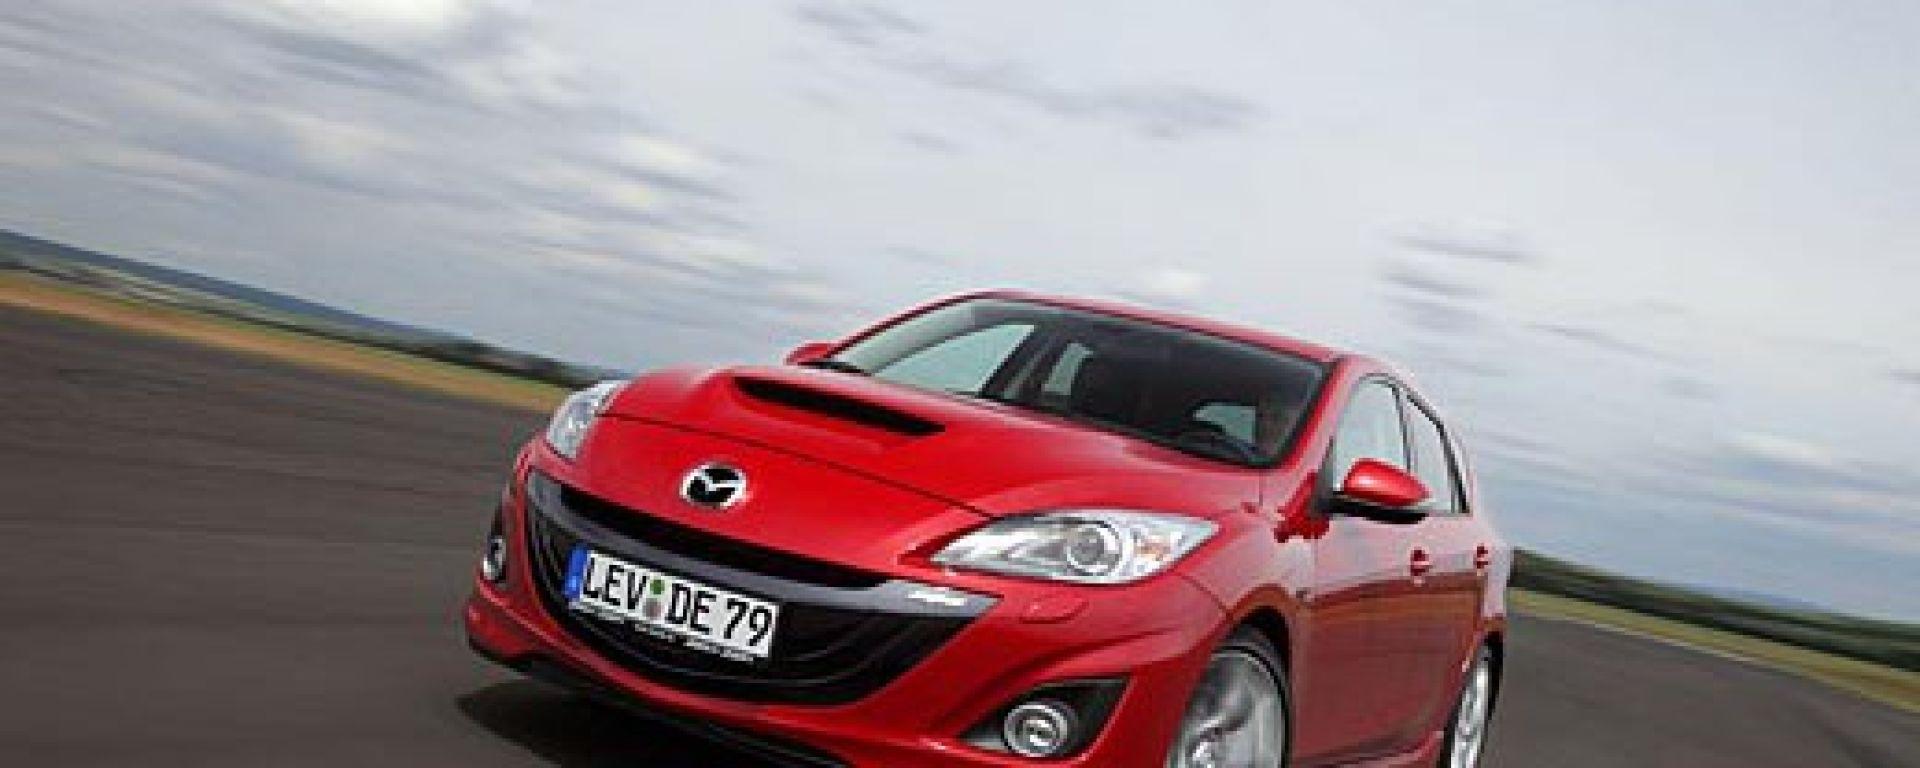 Mazda3 MPS 2010